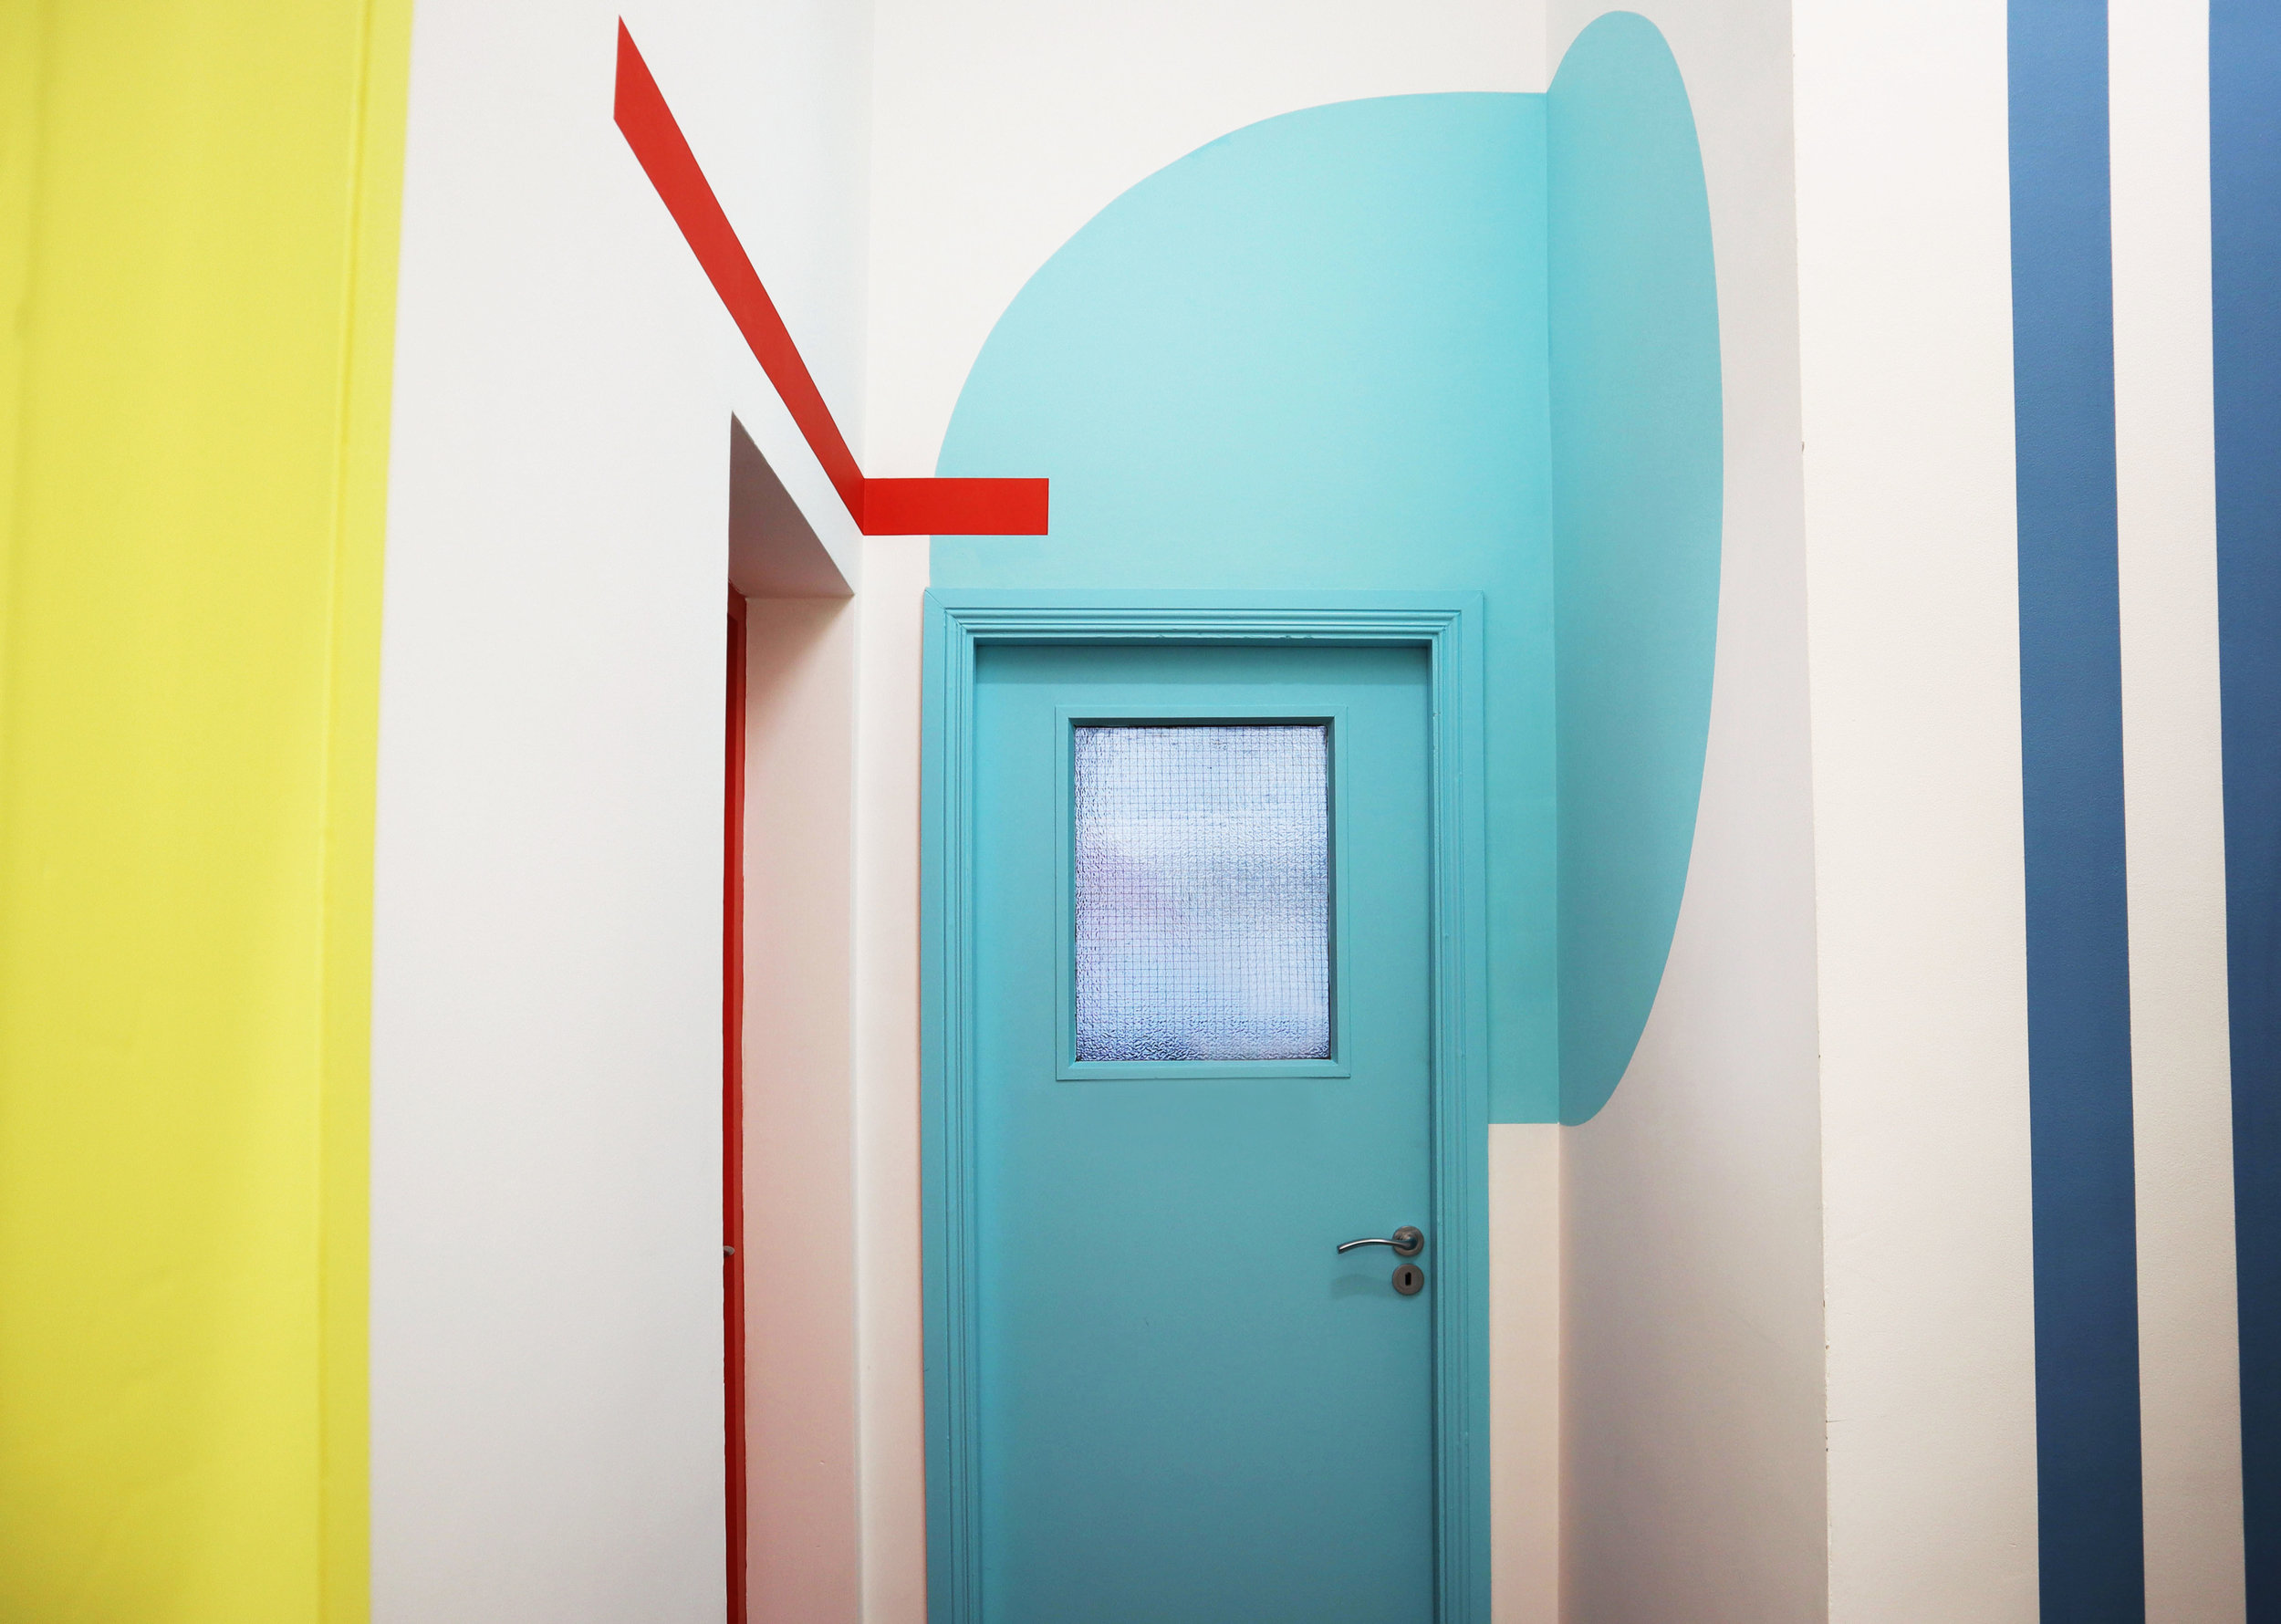 Pointy hallways, with bright geometric shapes.